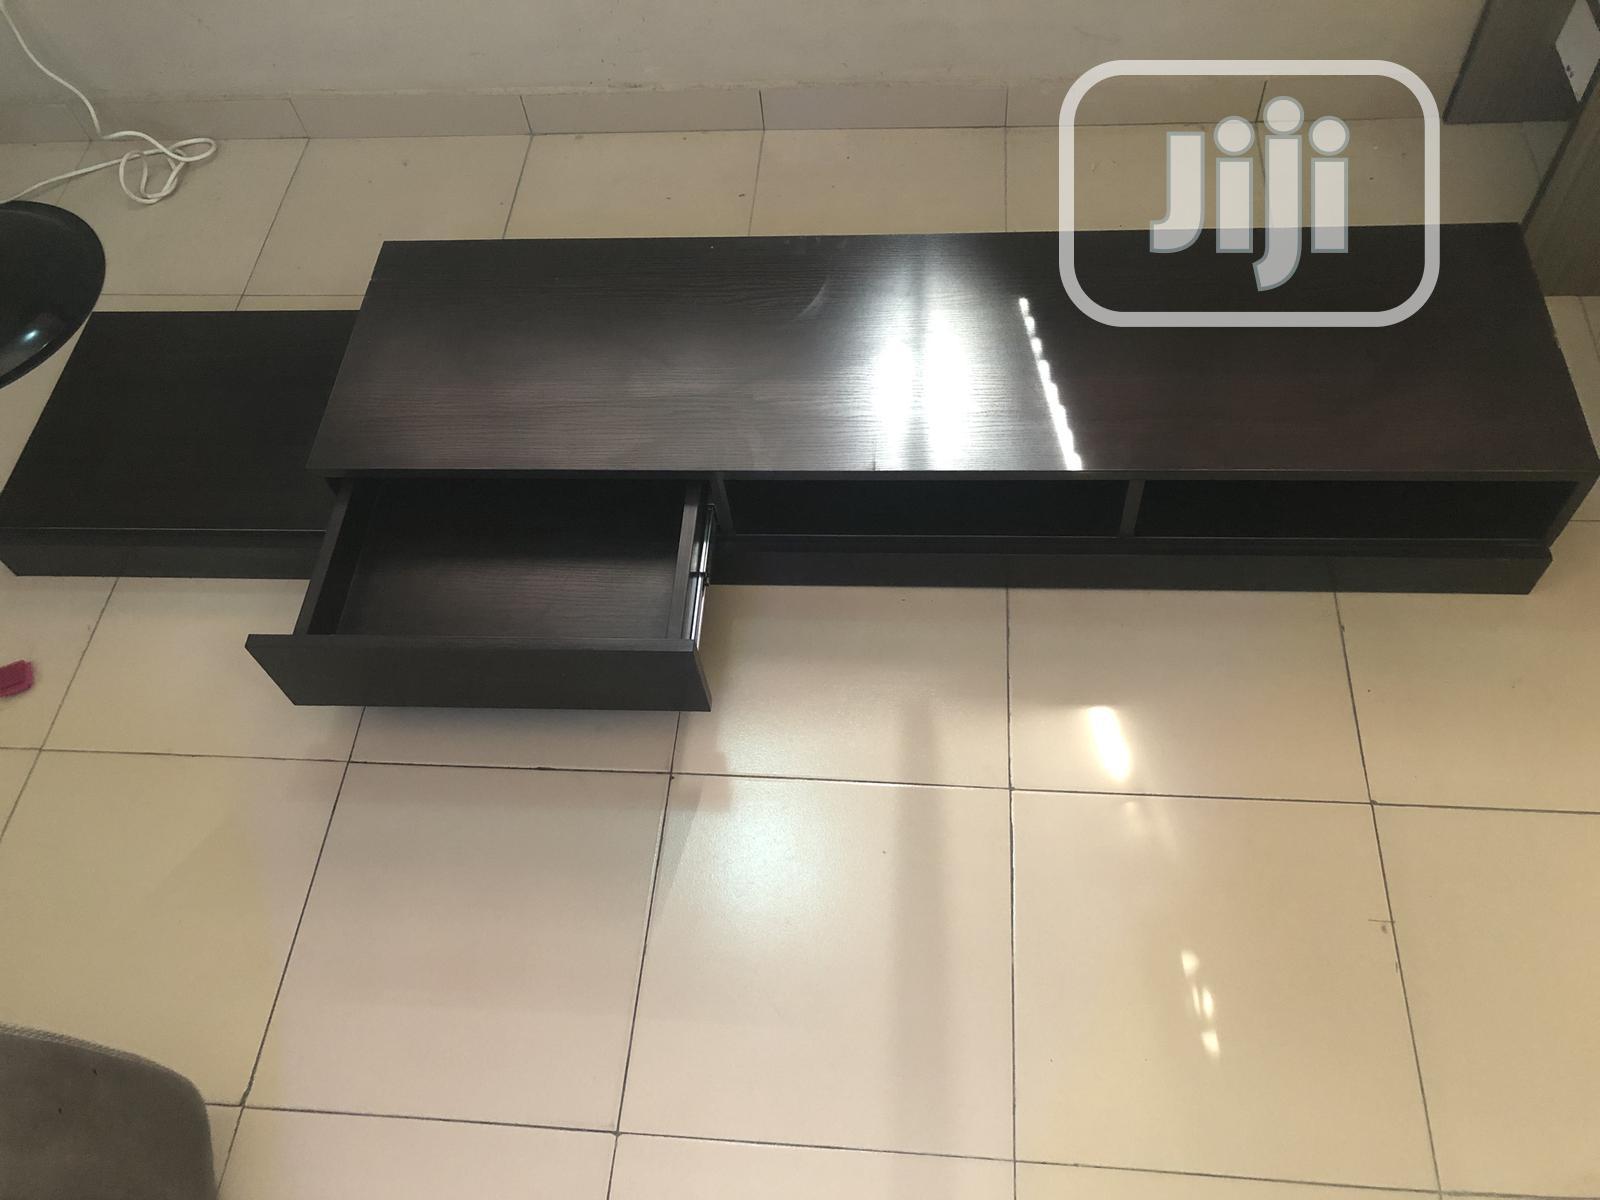 A Modern Design Tv Slim Tv Stand In Ikeja Furniture Abiodun Julius Jiji Ng For Sale In Ikeja Buy Furniture From Abiodun Julius On Jiji Ng